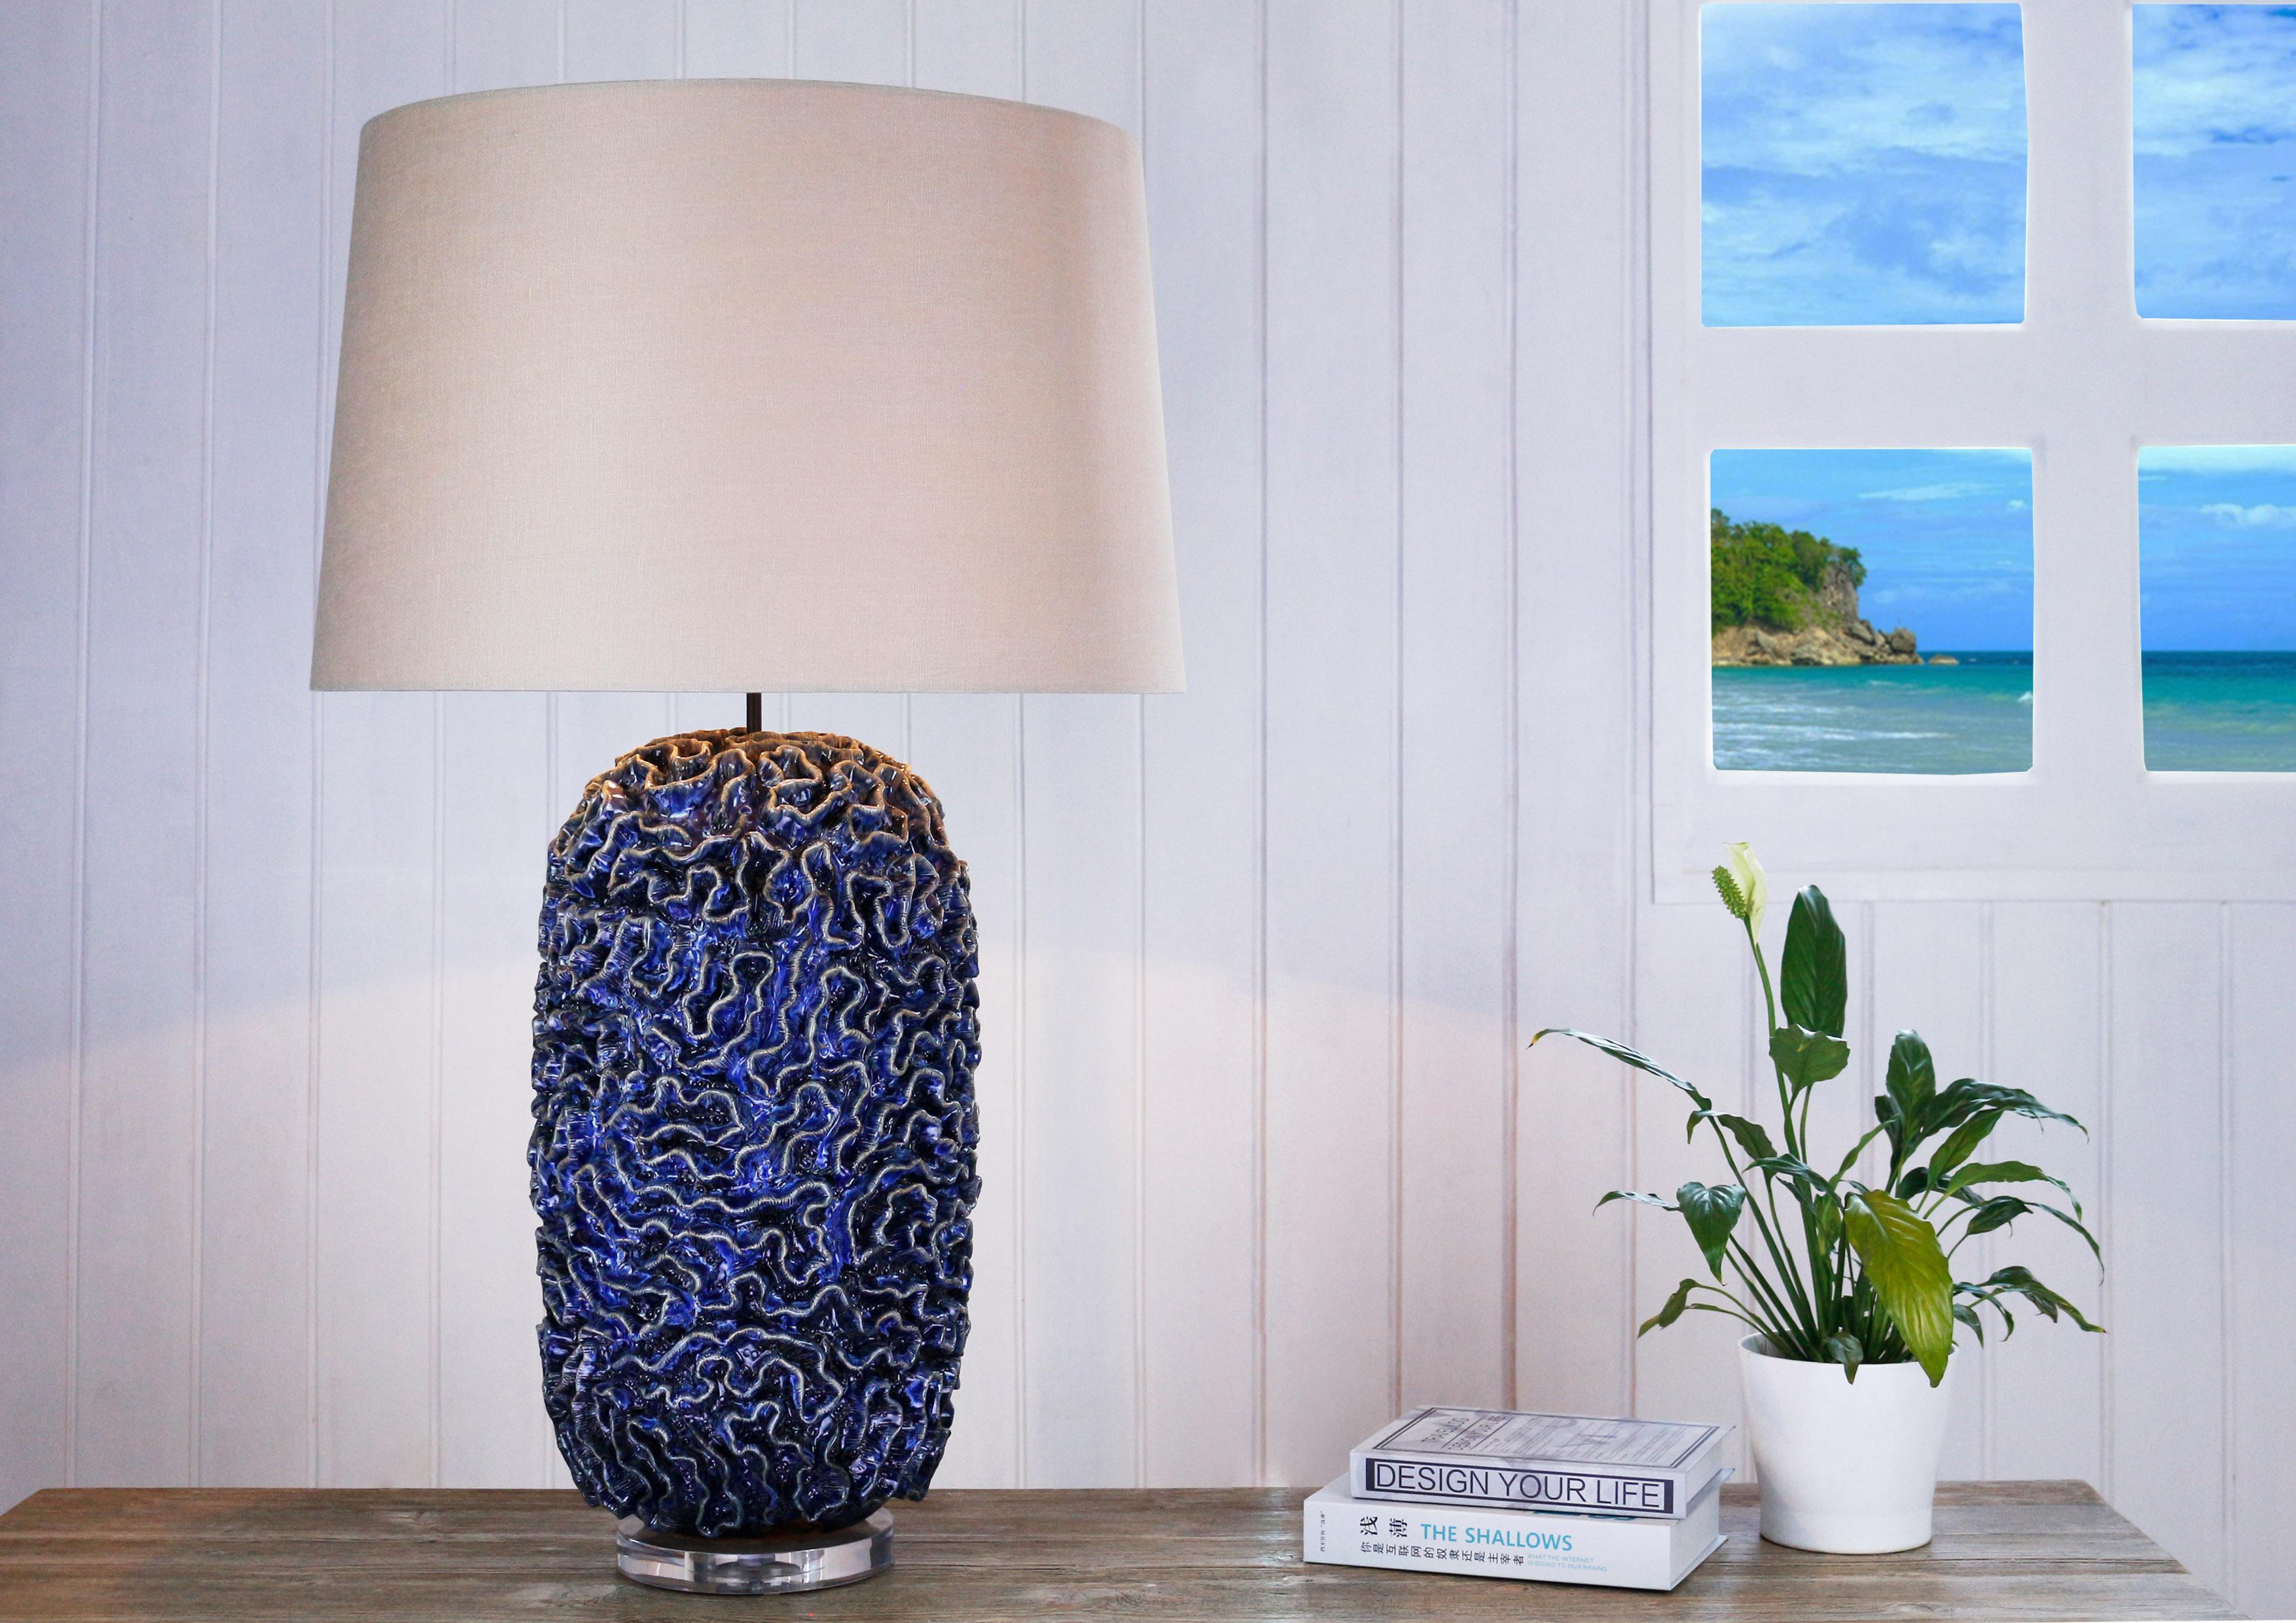 Similan ceramic product photo #2